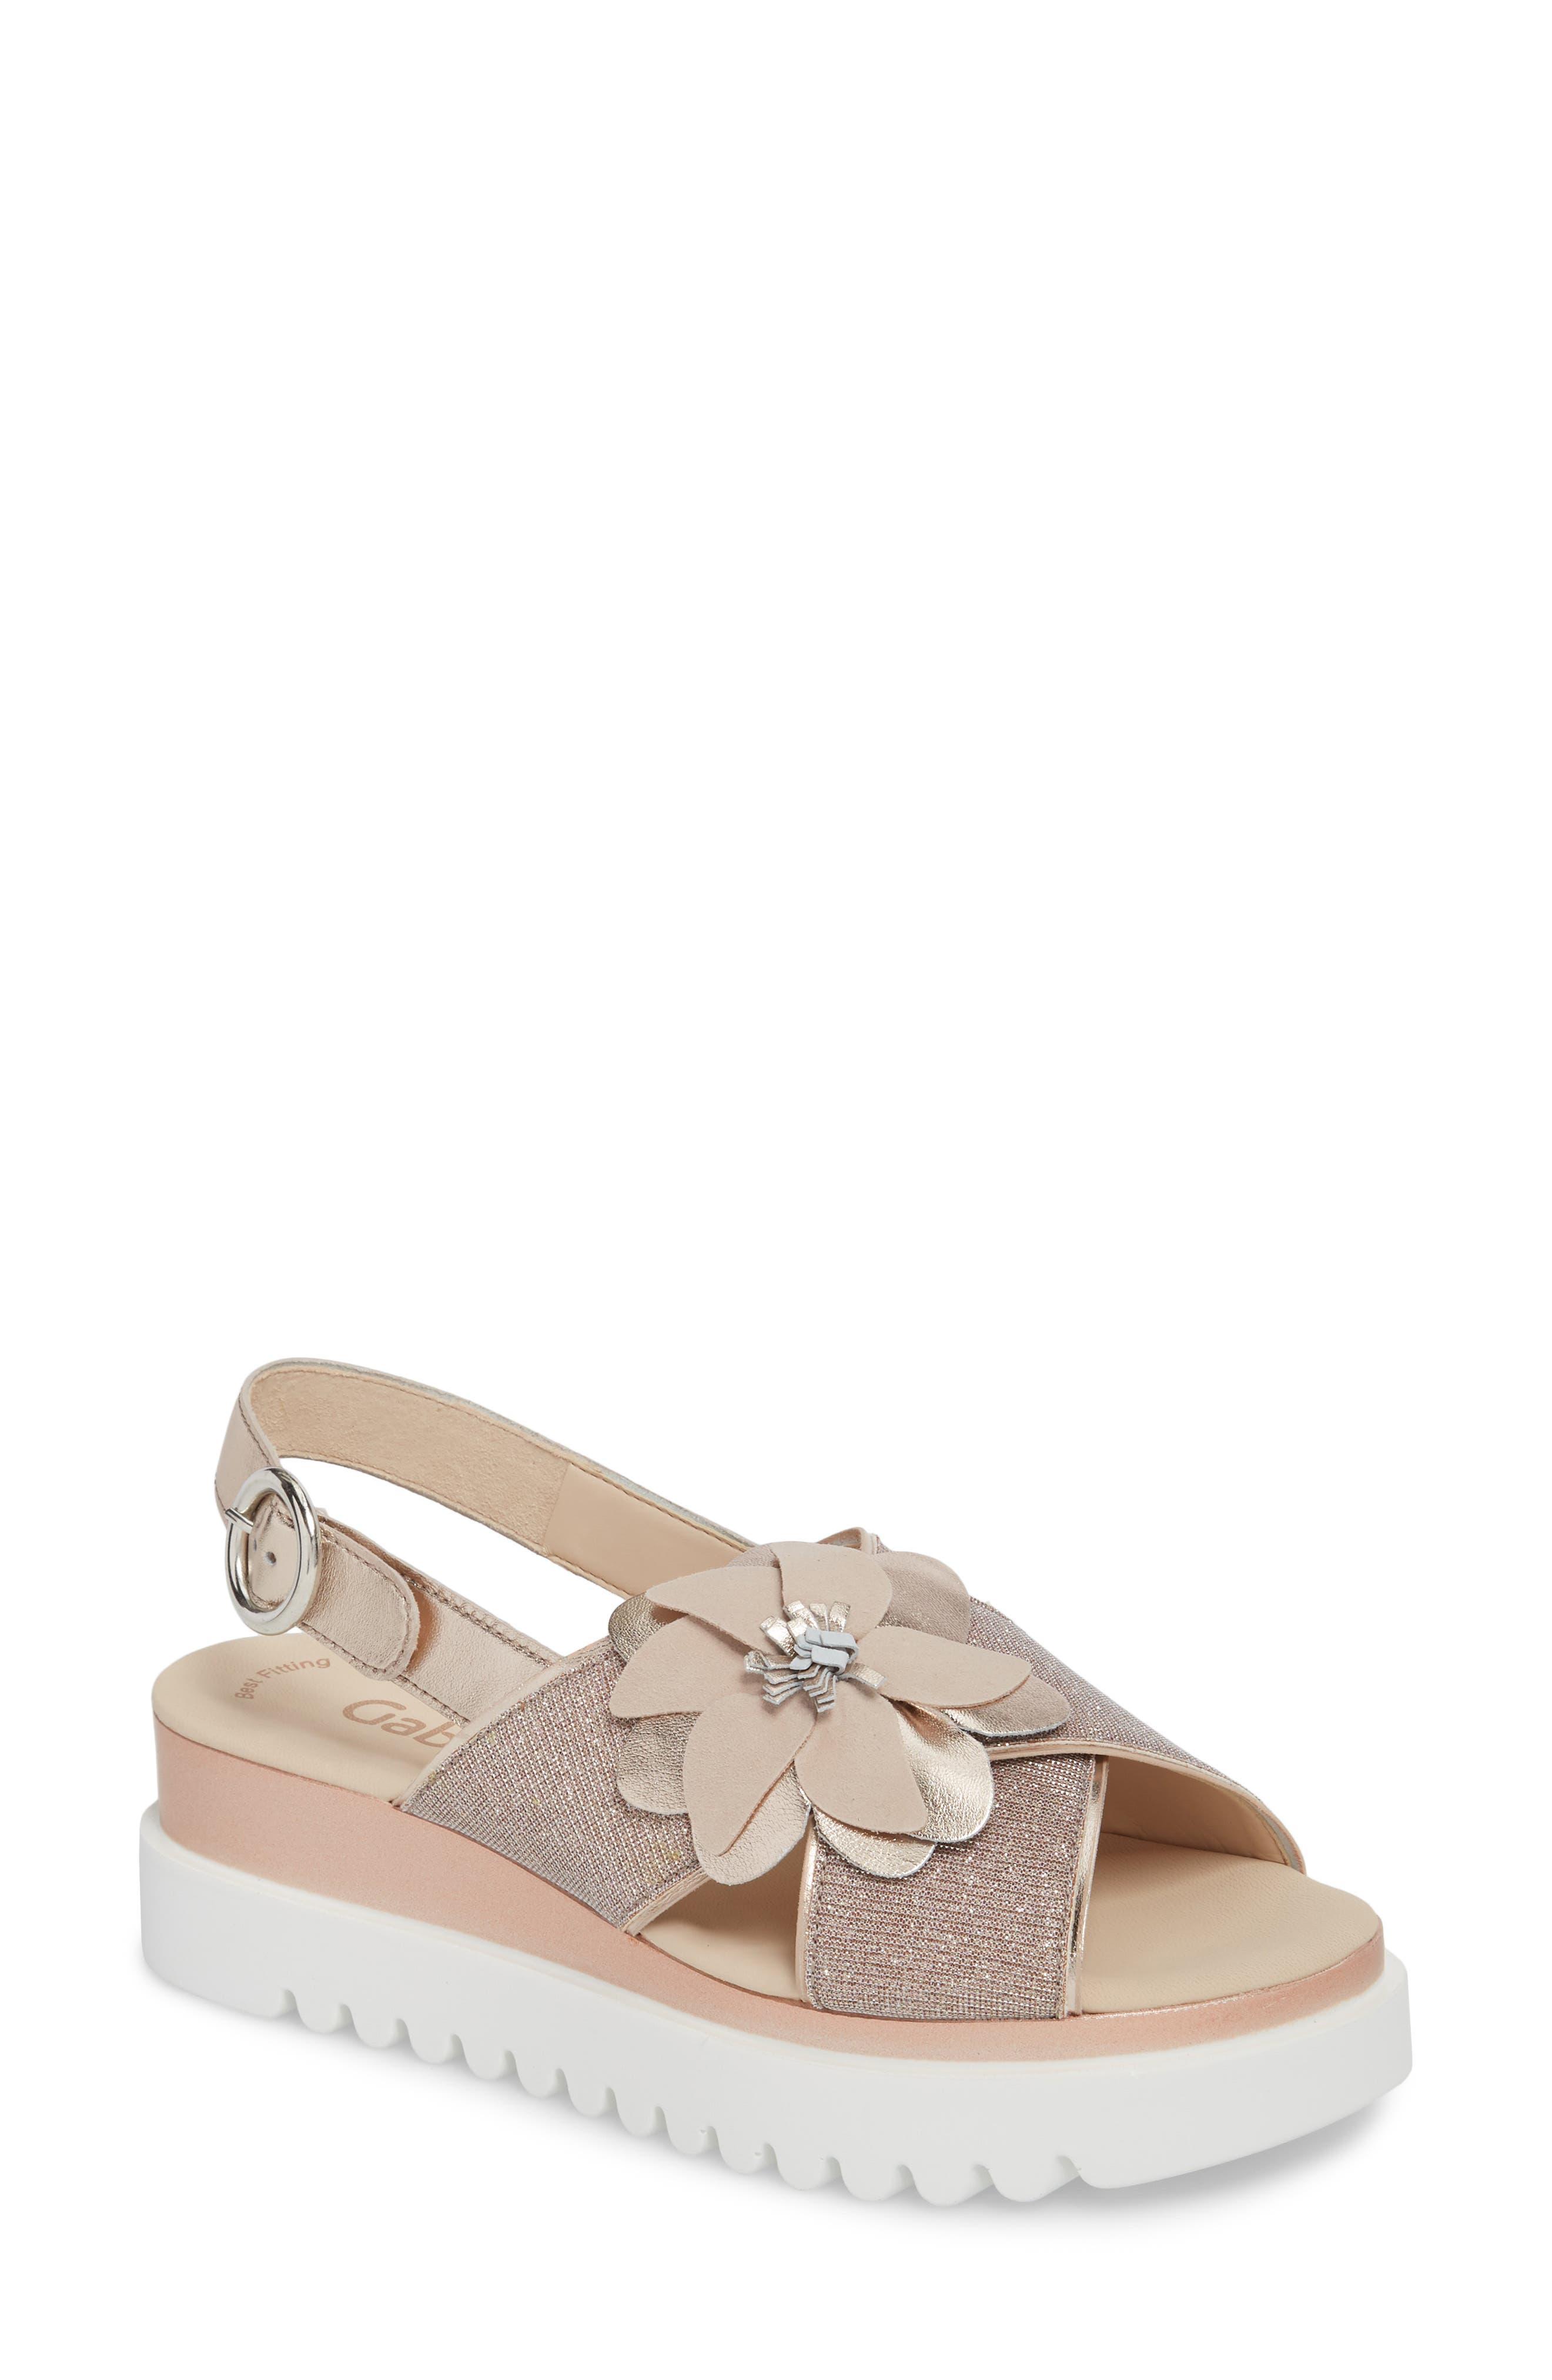 Flower Platform Sandal,                             Main thumbnail 1, color,                             Rose Metallic Fabric